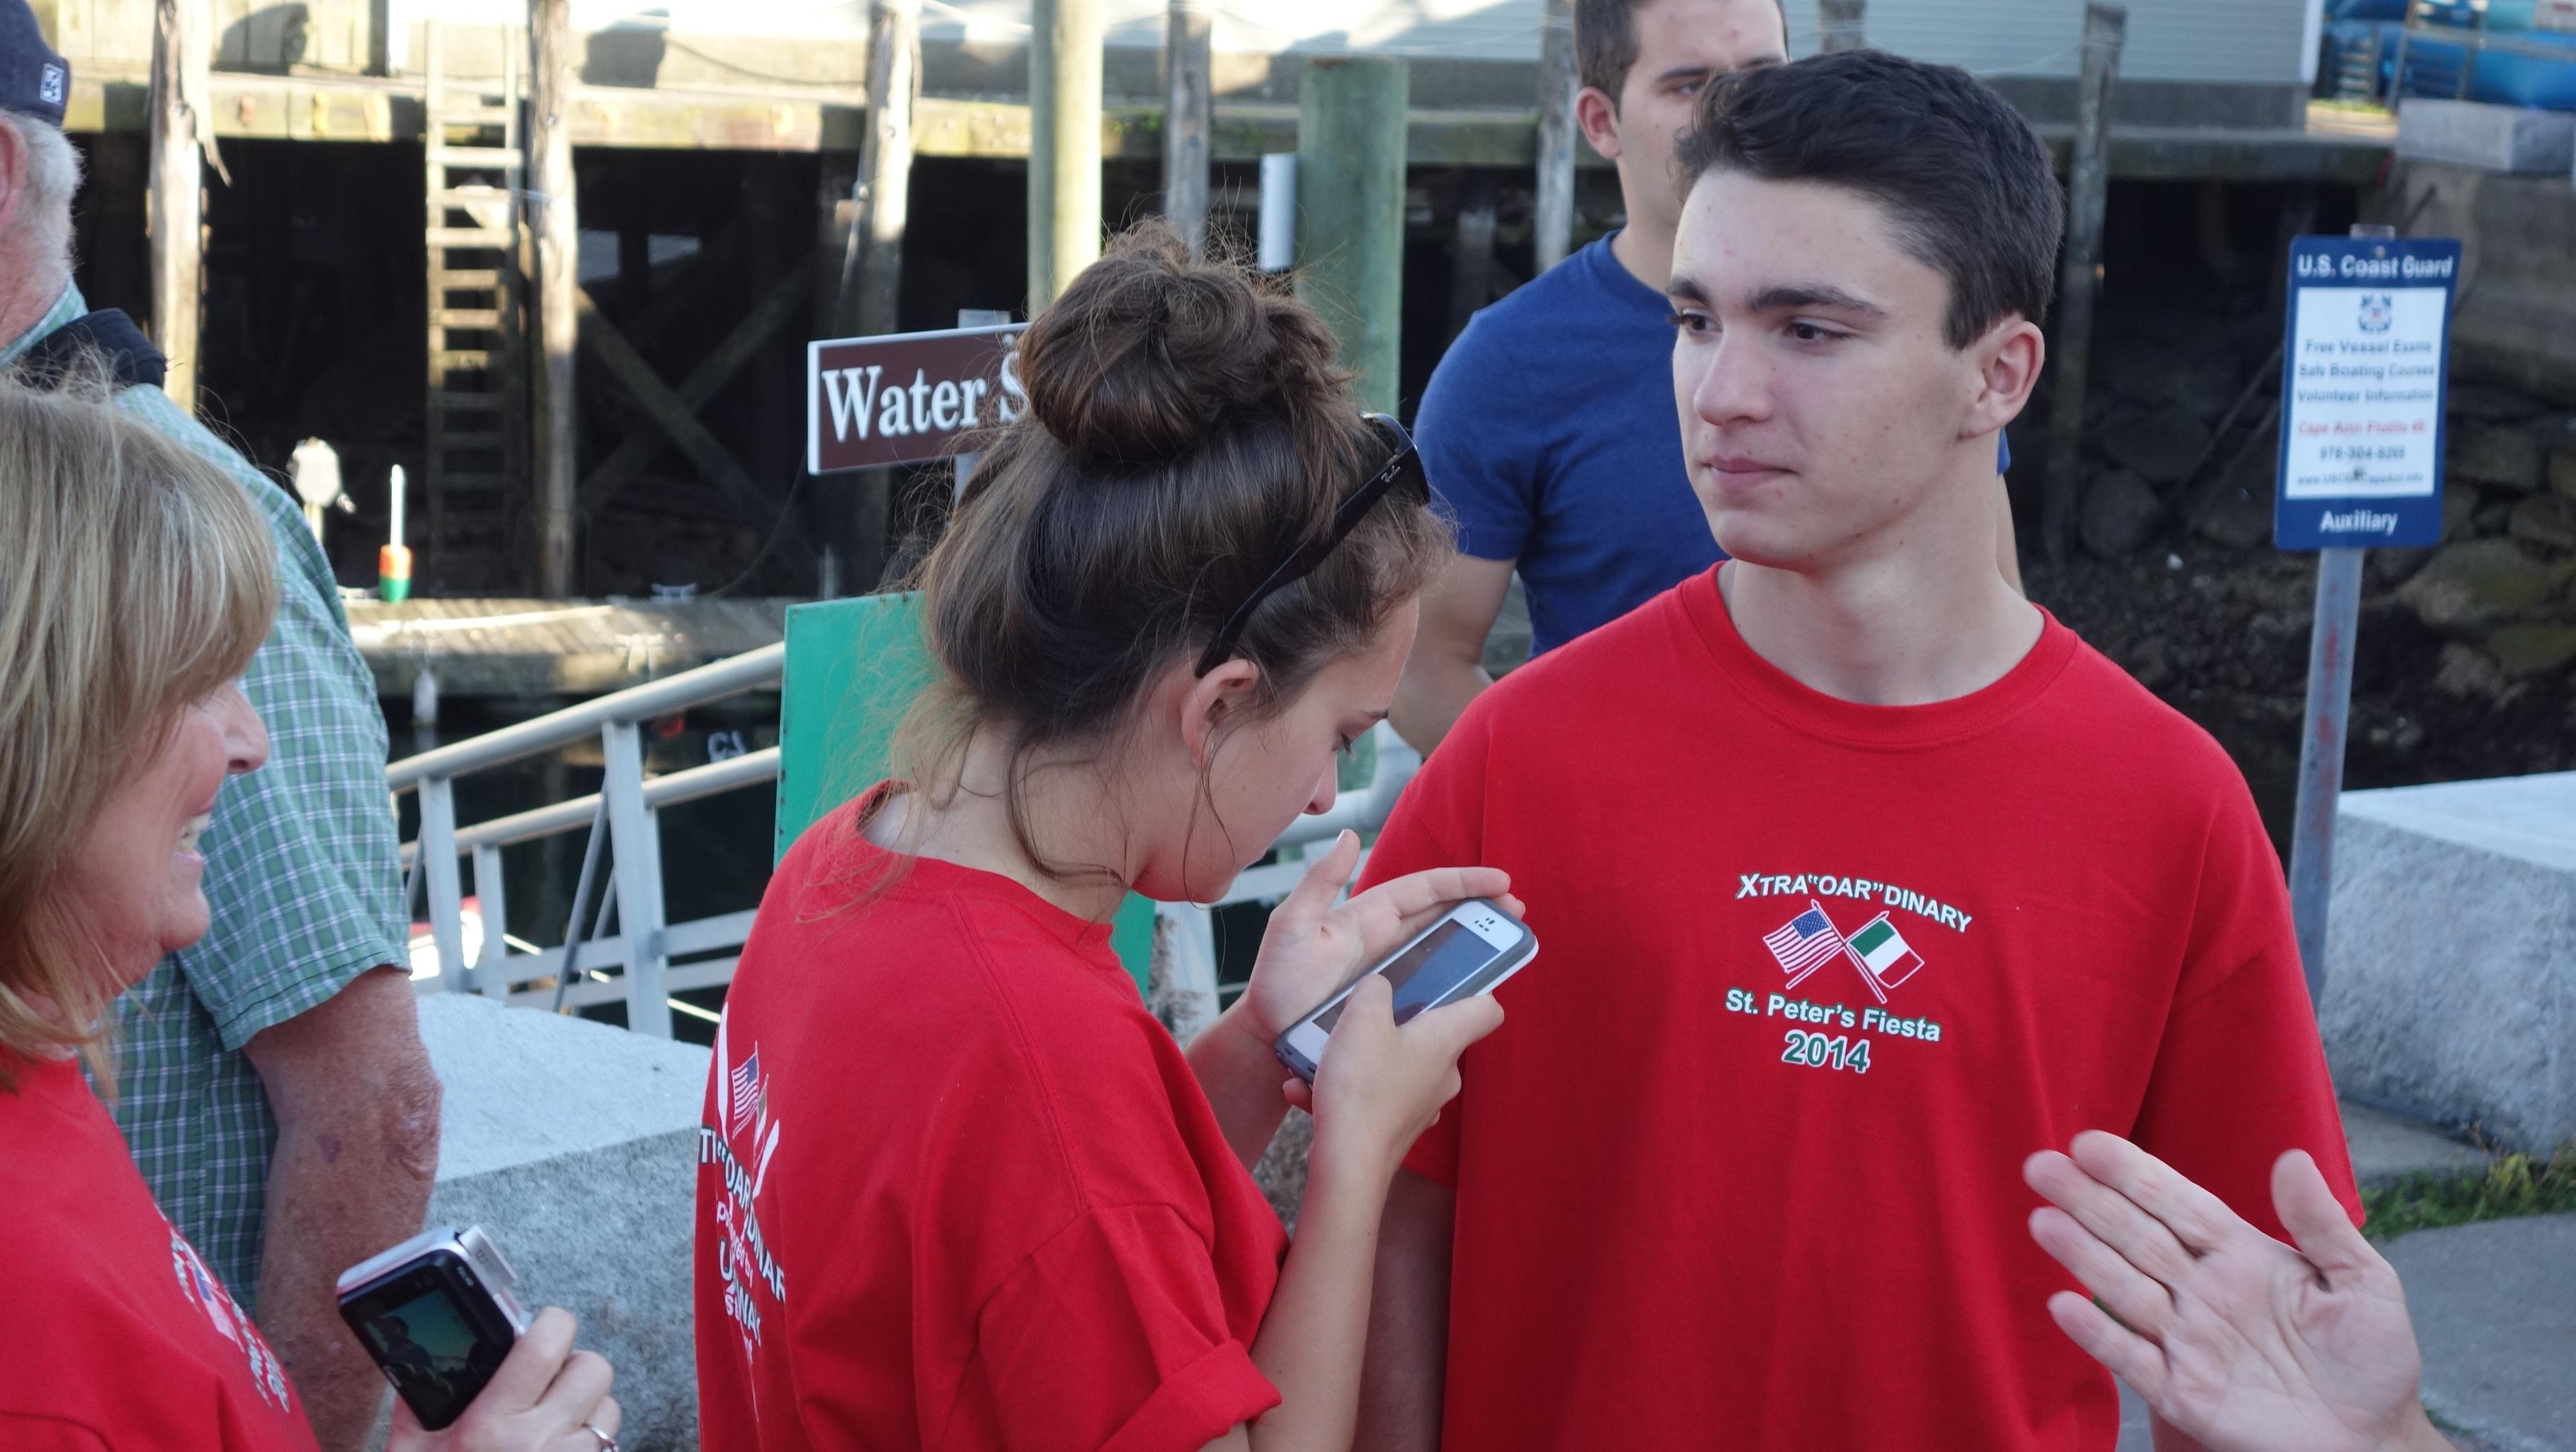 Amanda Race St. Peter's Fiesta 2014 Camps! 388